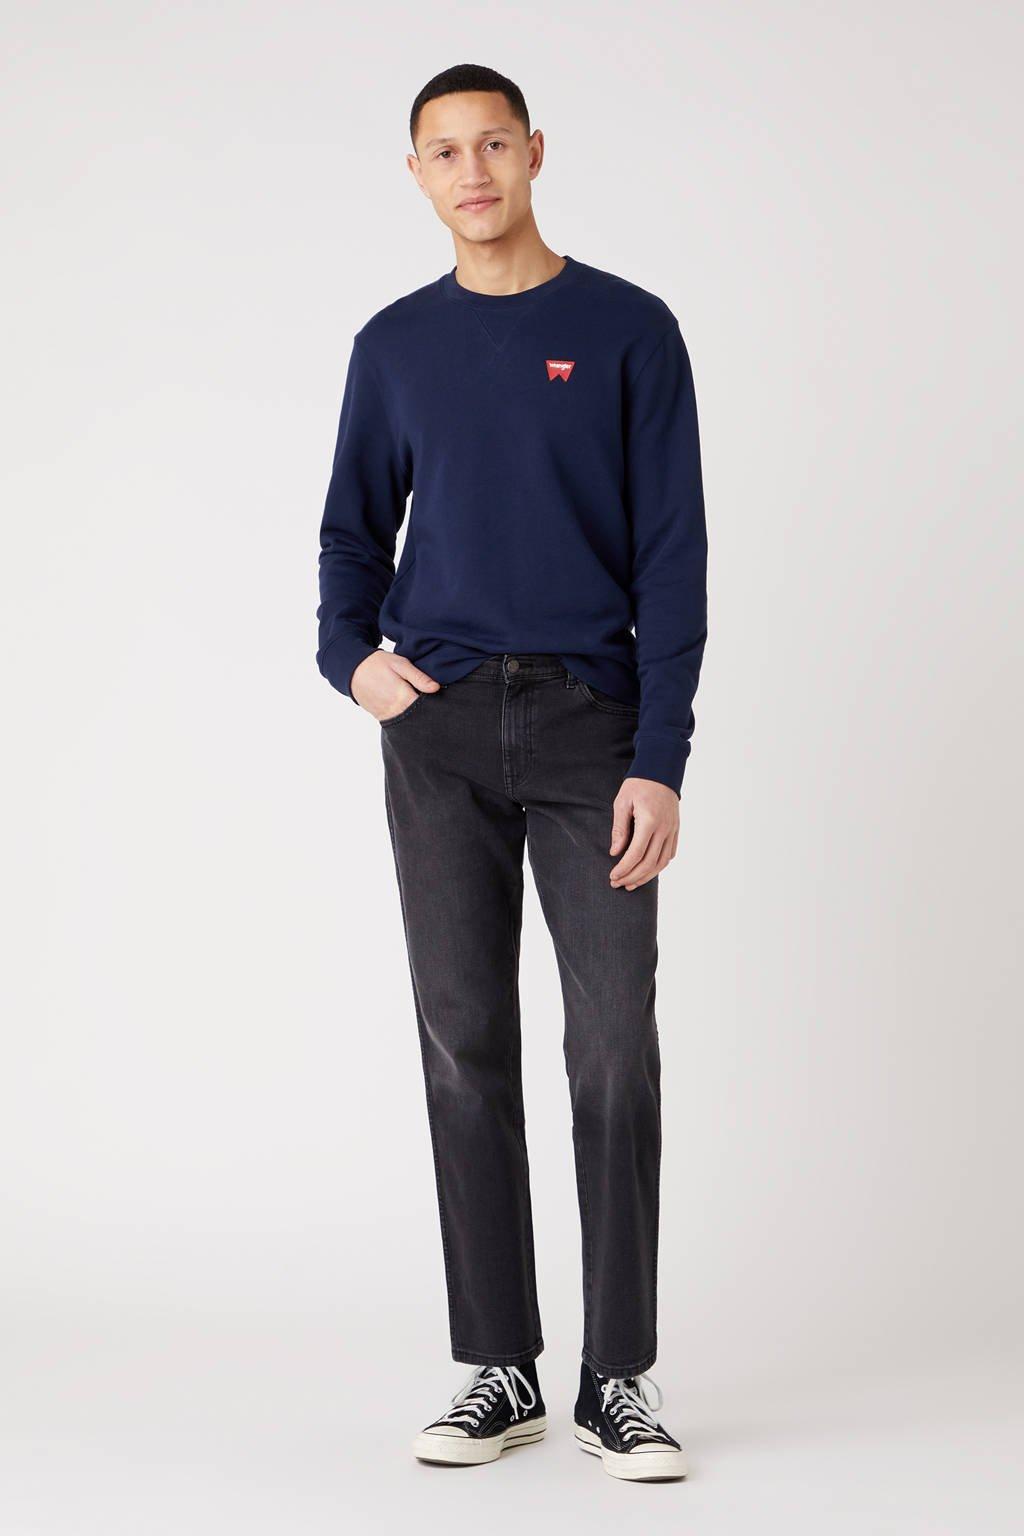 Wrangler straight fit jeans TEXAS like a champ, Like a Champ